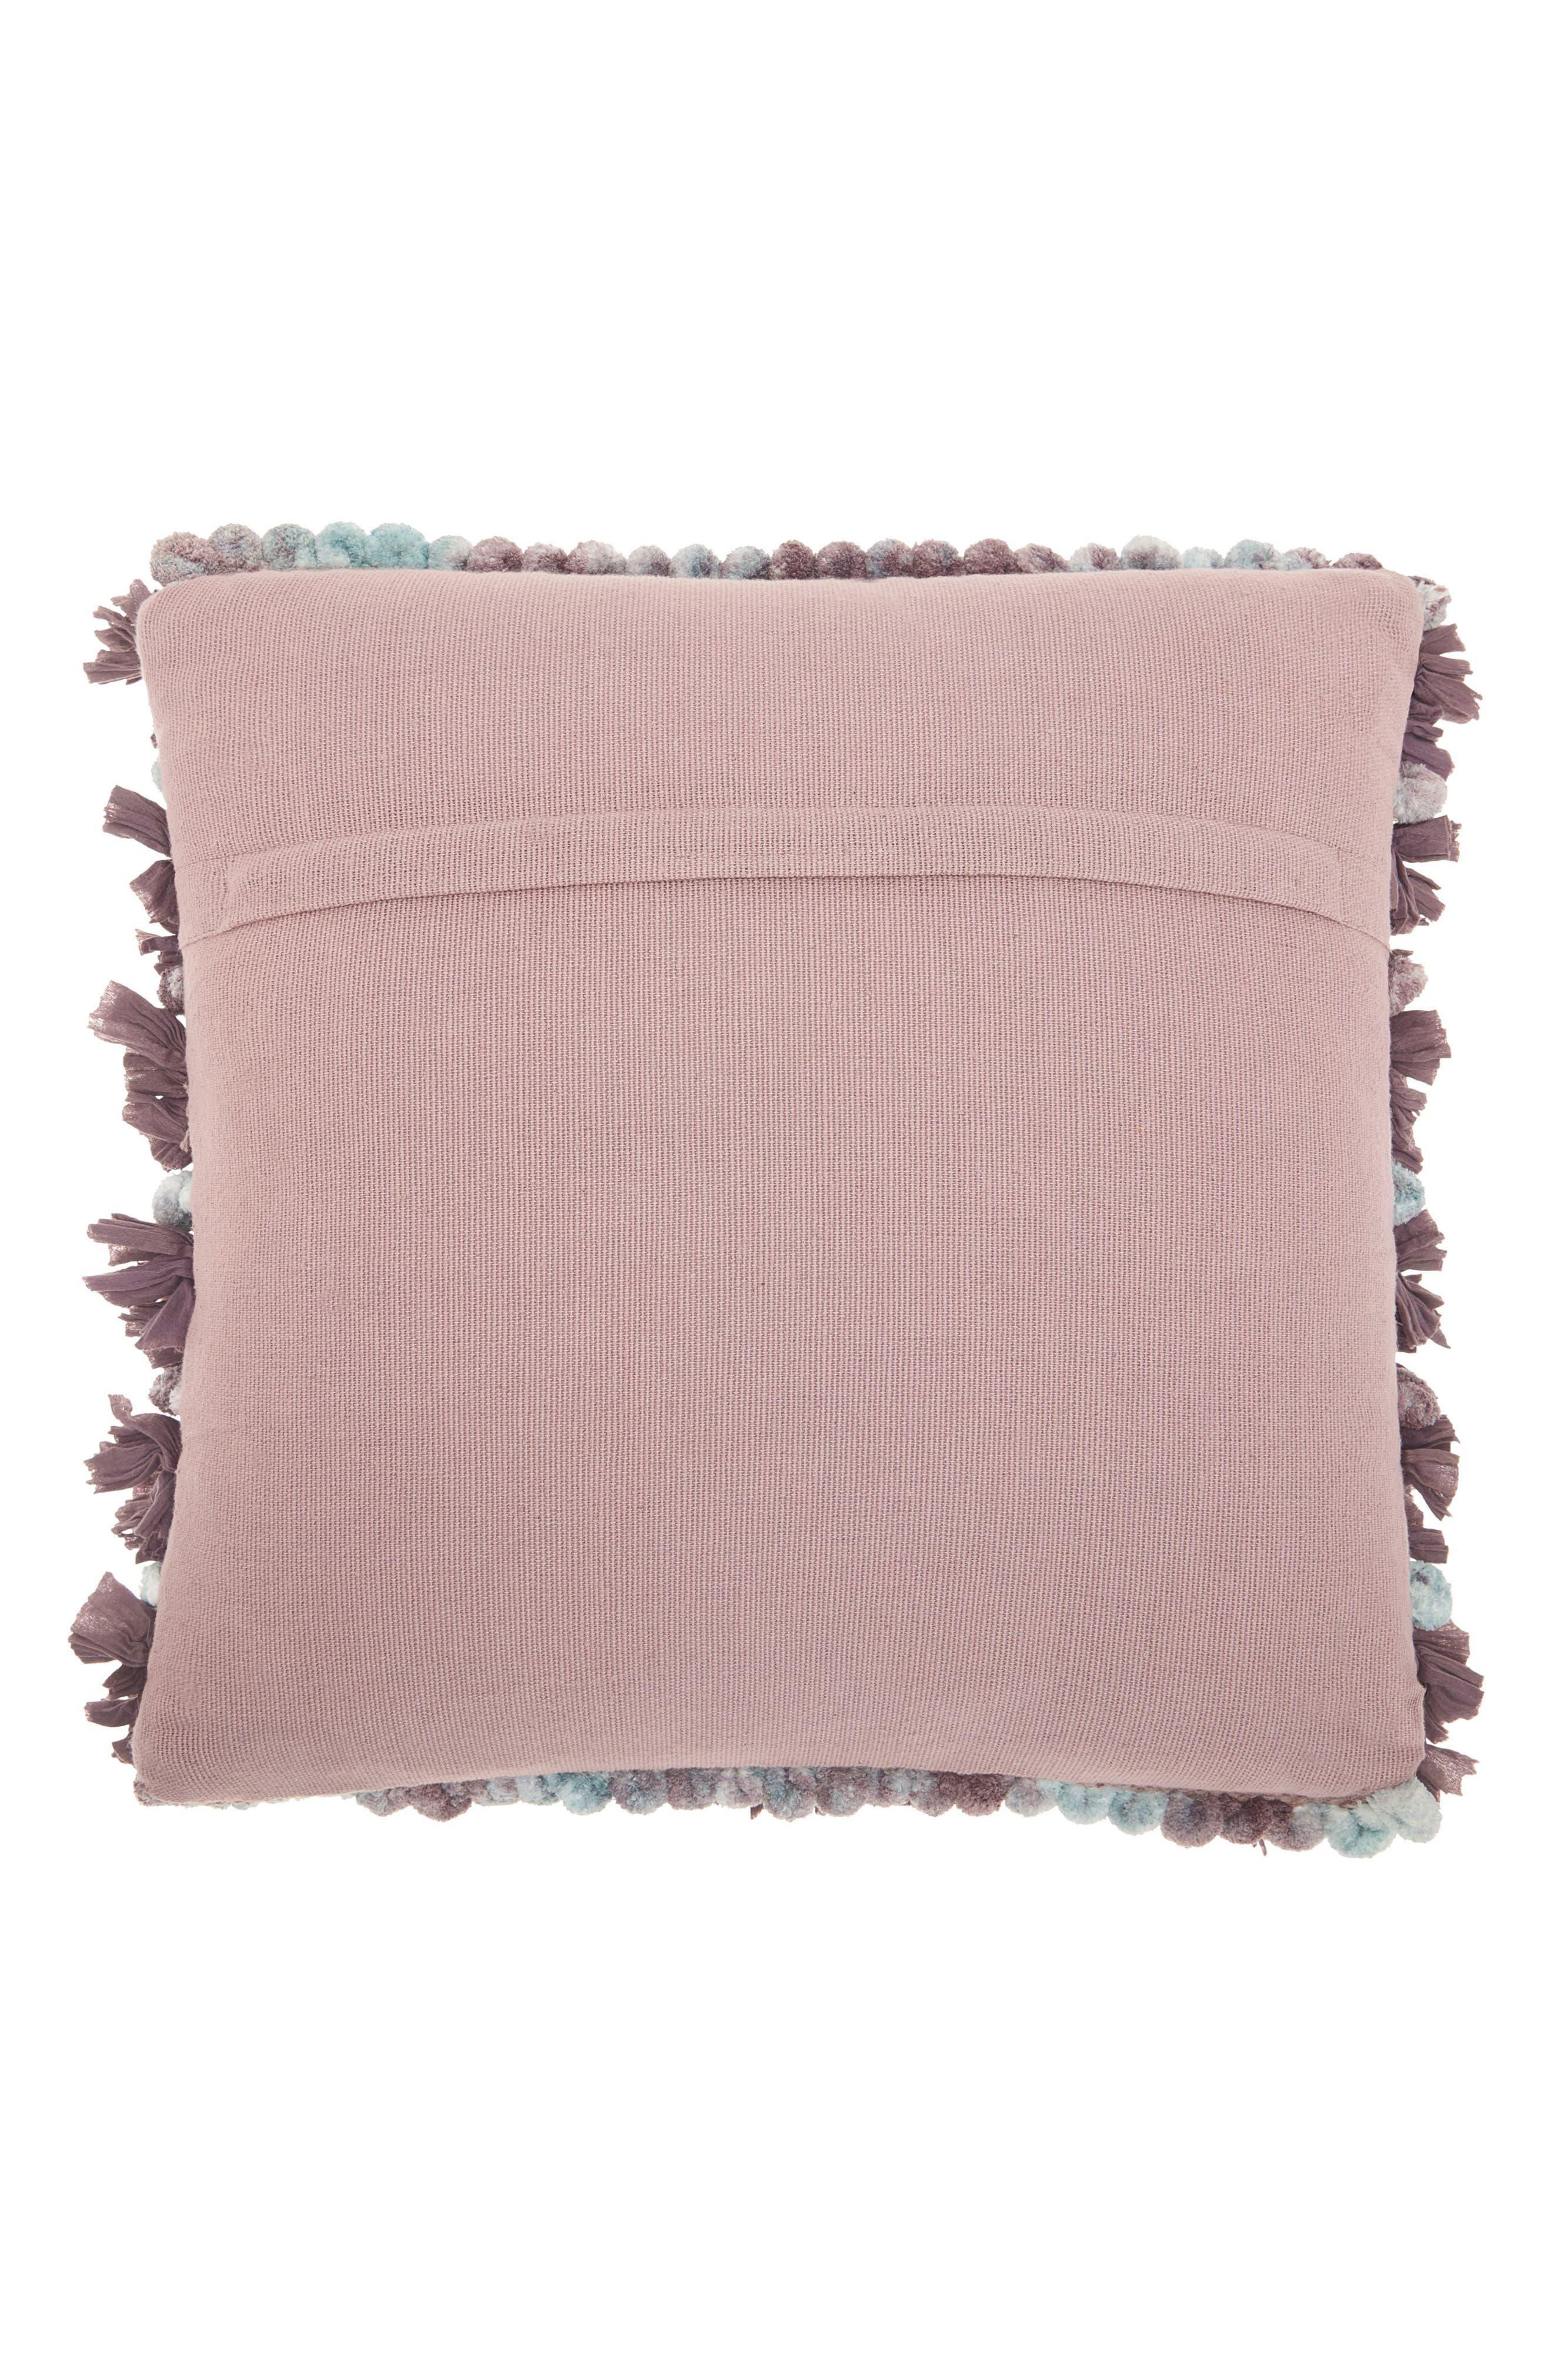 Paper Loop & Pompom Shag Pillow,                             Alternate thumbnail 2, color,                             Lavender